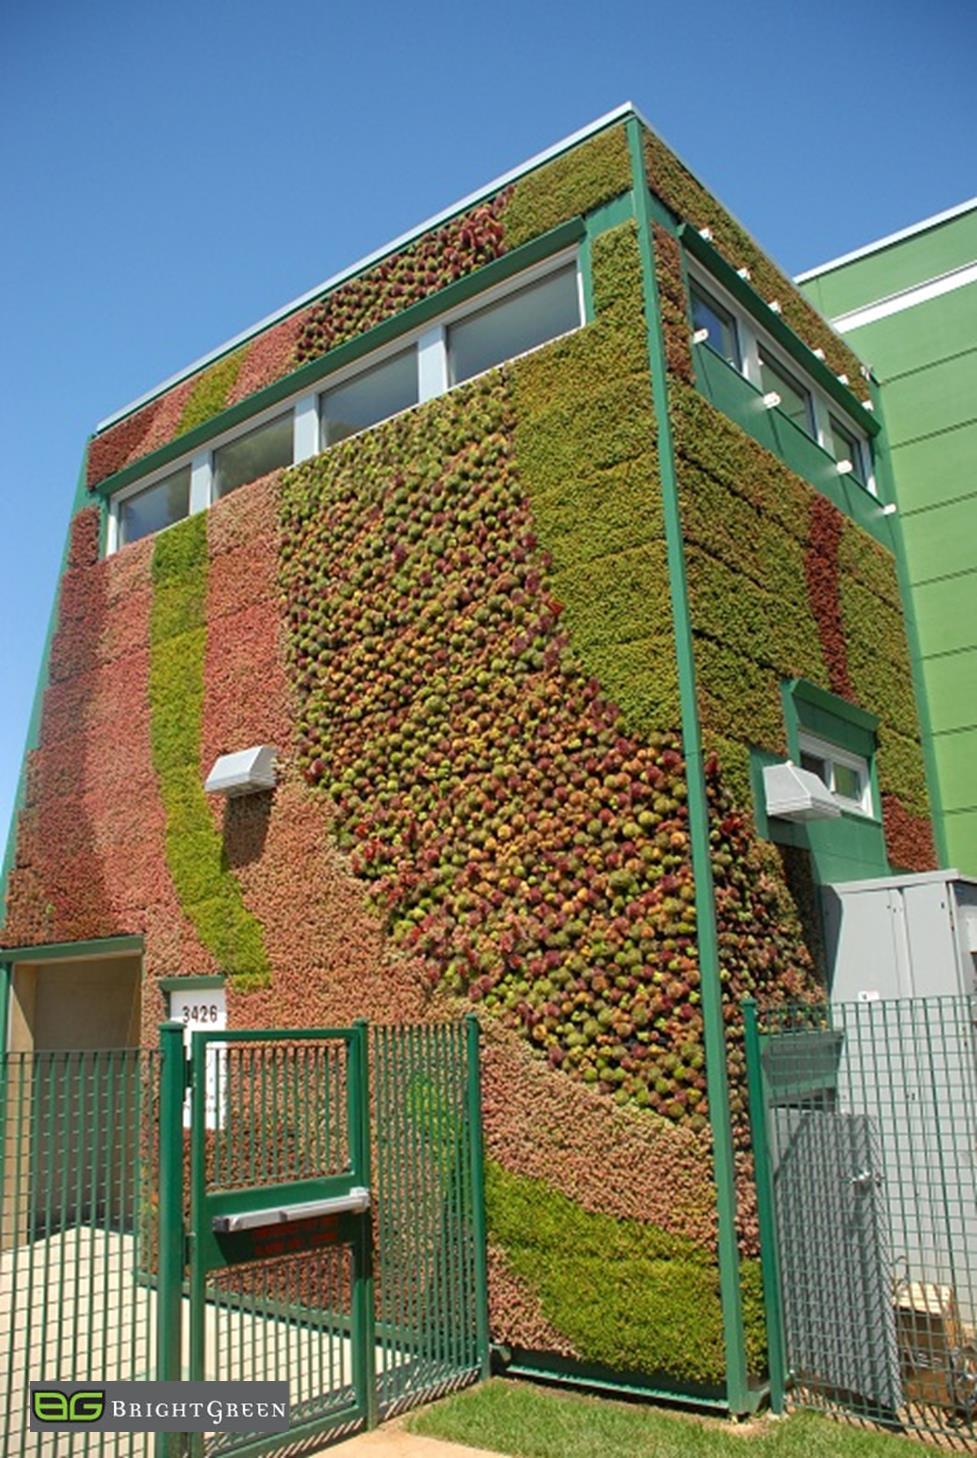 Edible Walls - Shade Tolerant Gardens